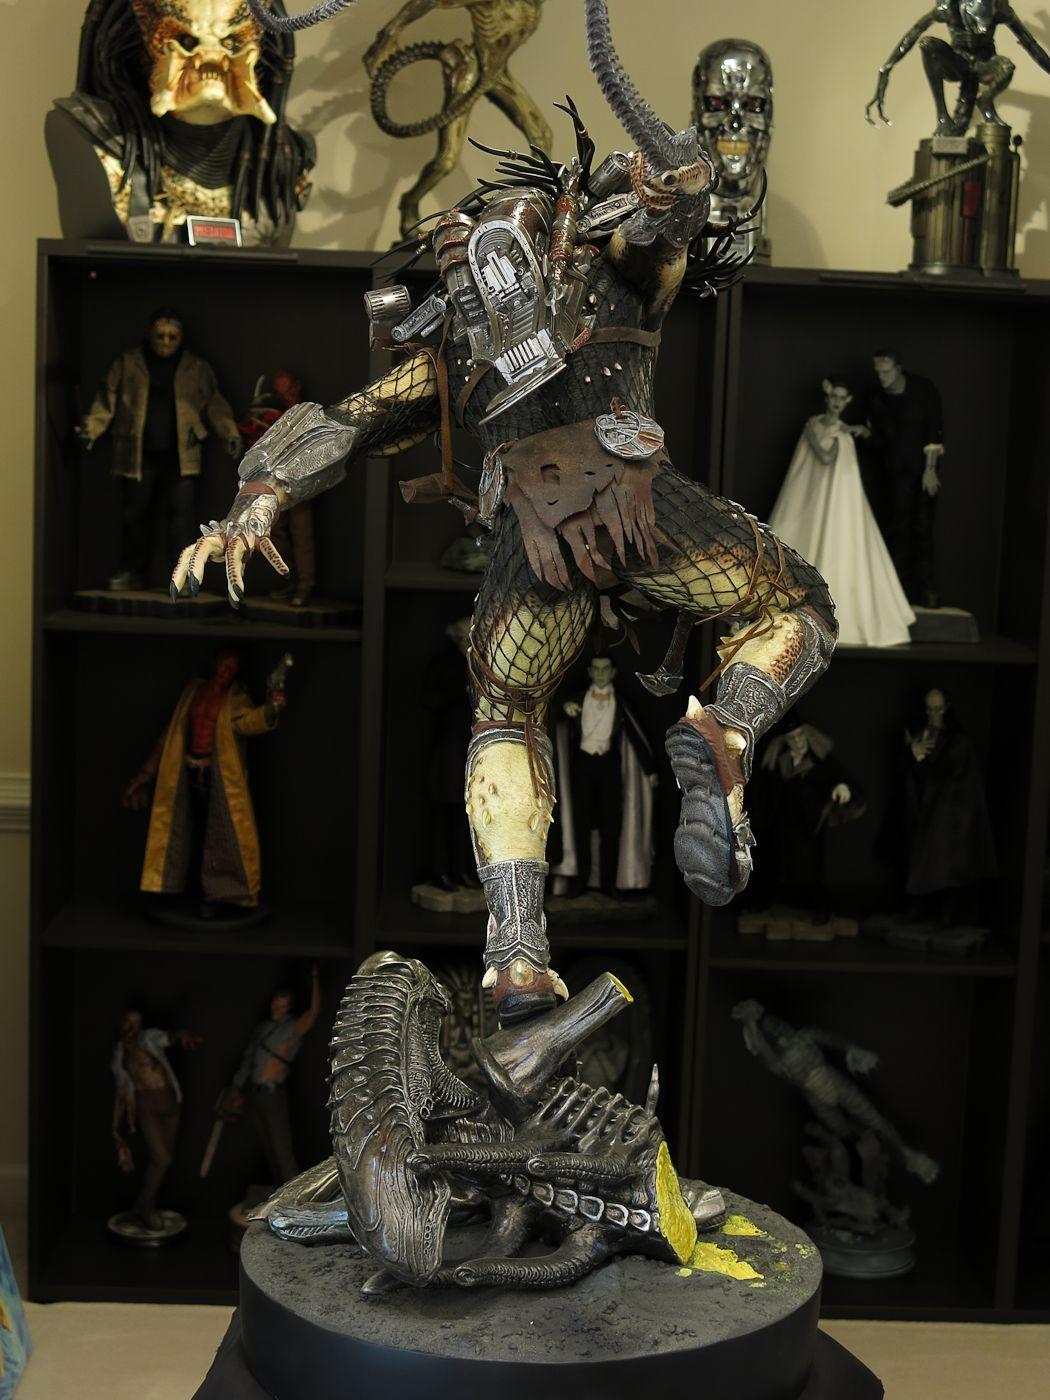 ALIENS VS PREDATORS: WOLF PREDATOR Legendary scale figure 12